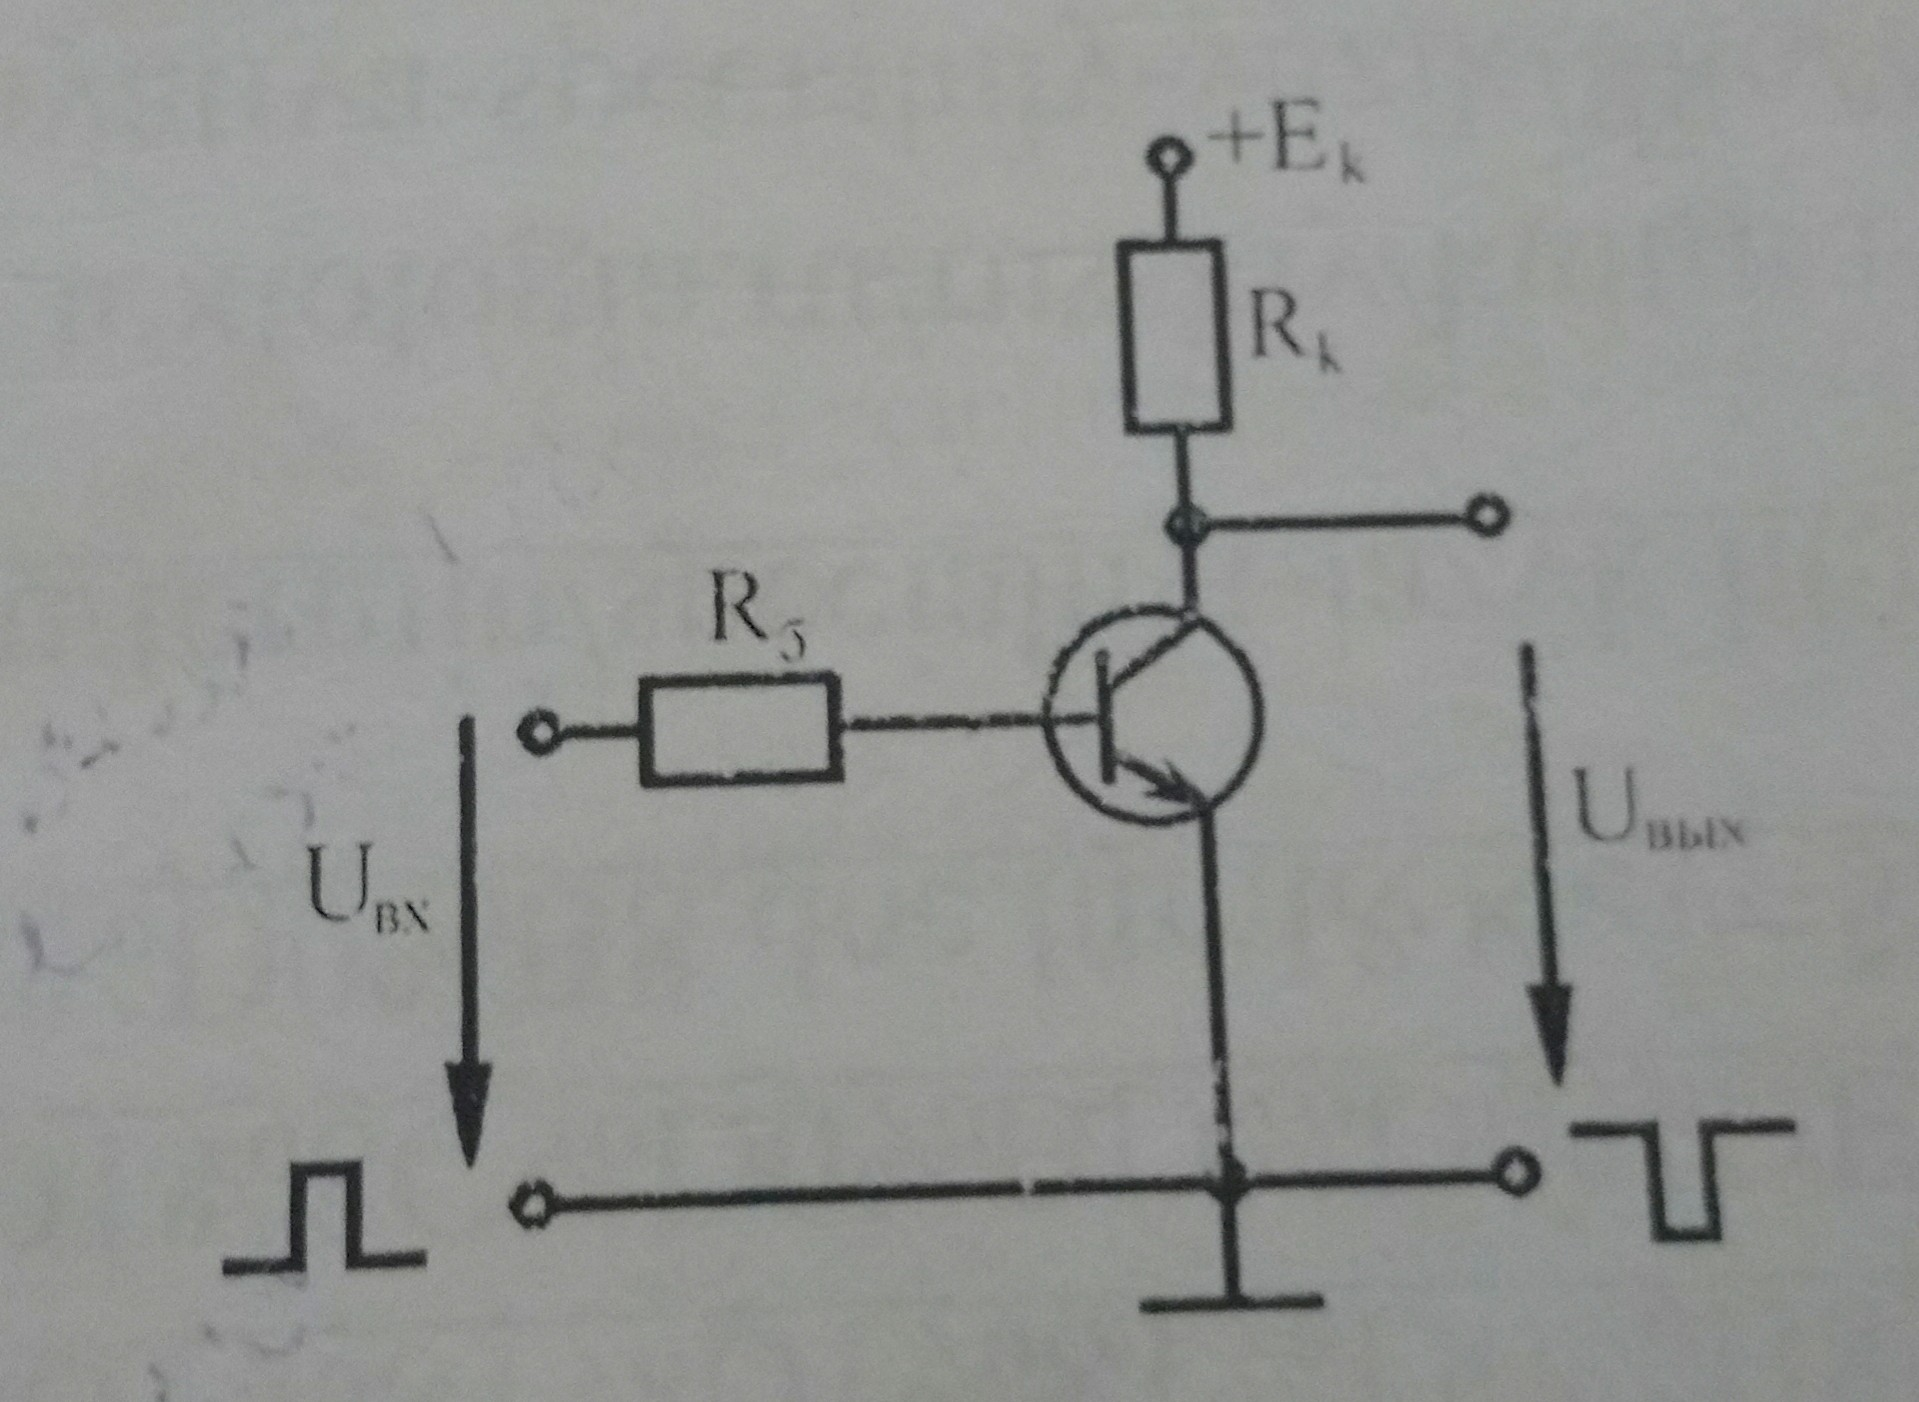 институте транзисторный ключ на фотодиоде текстуры